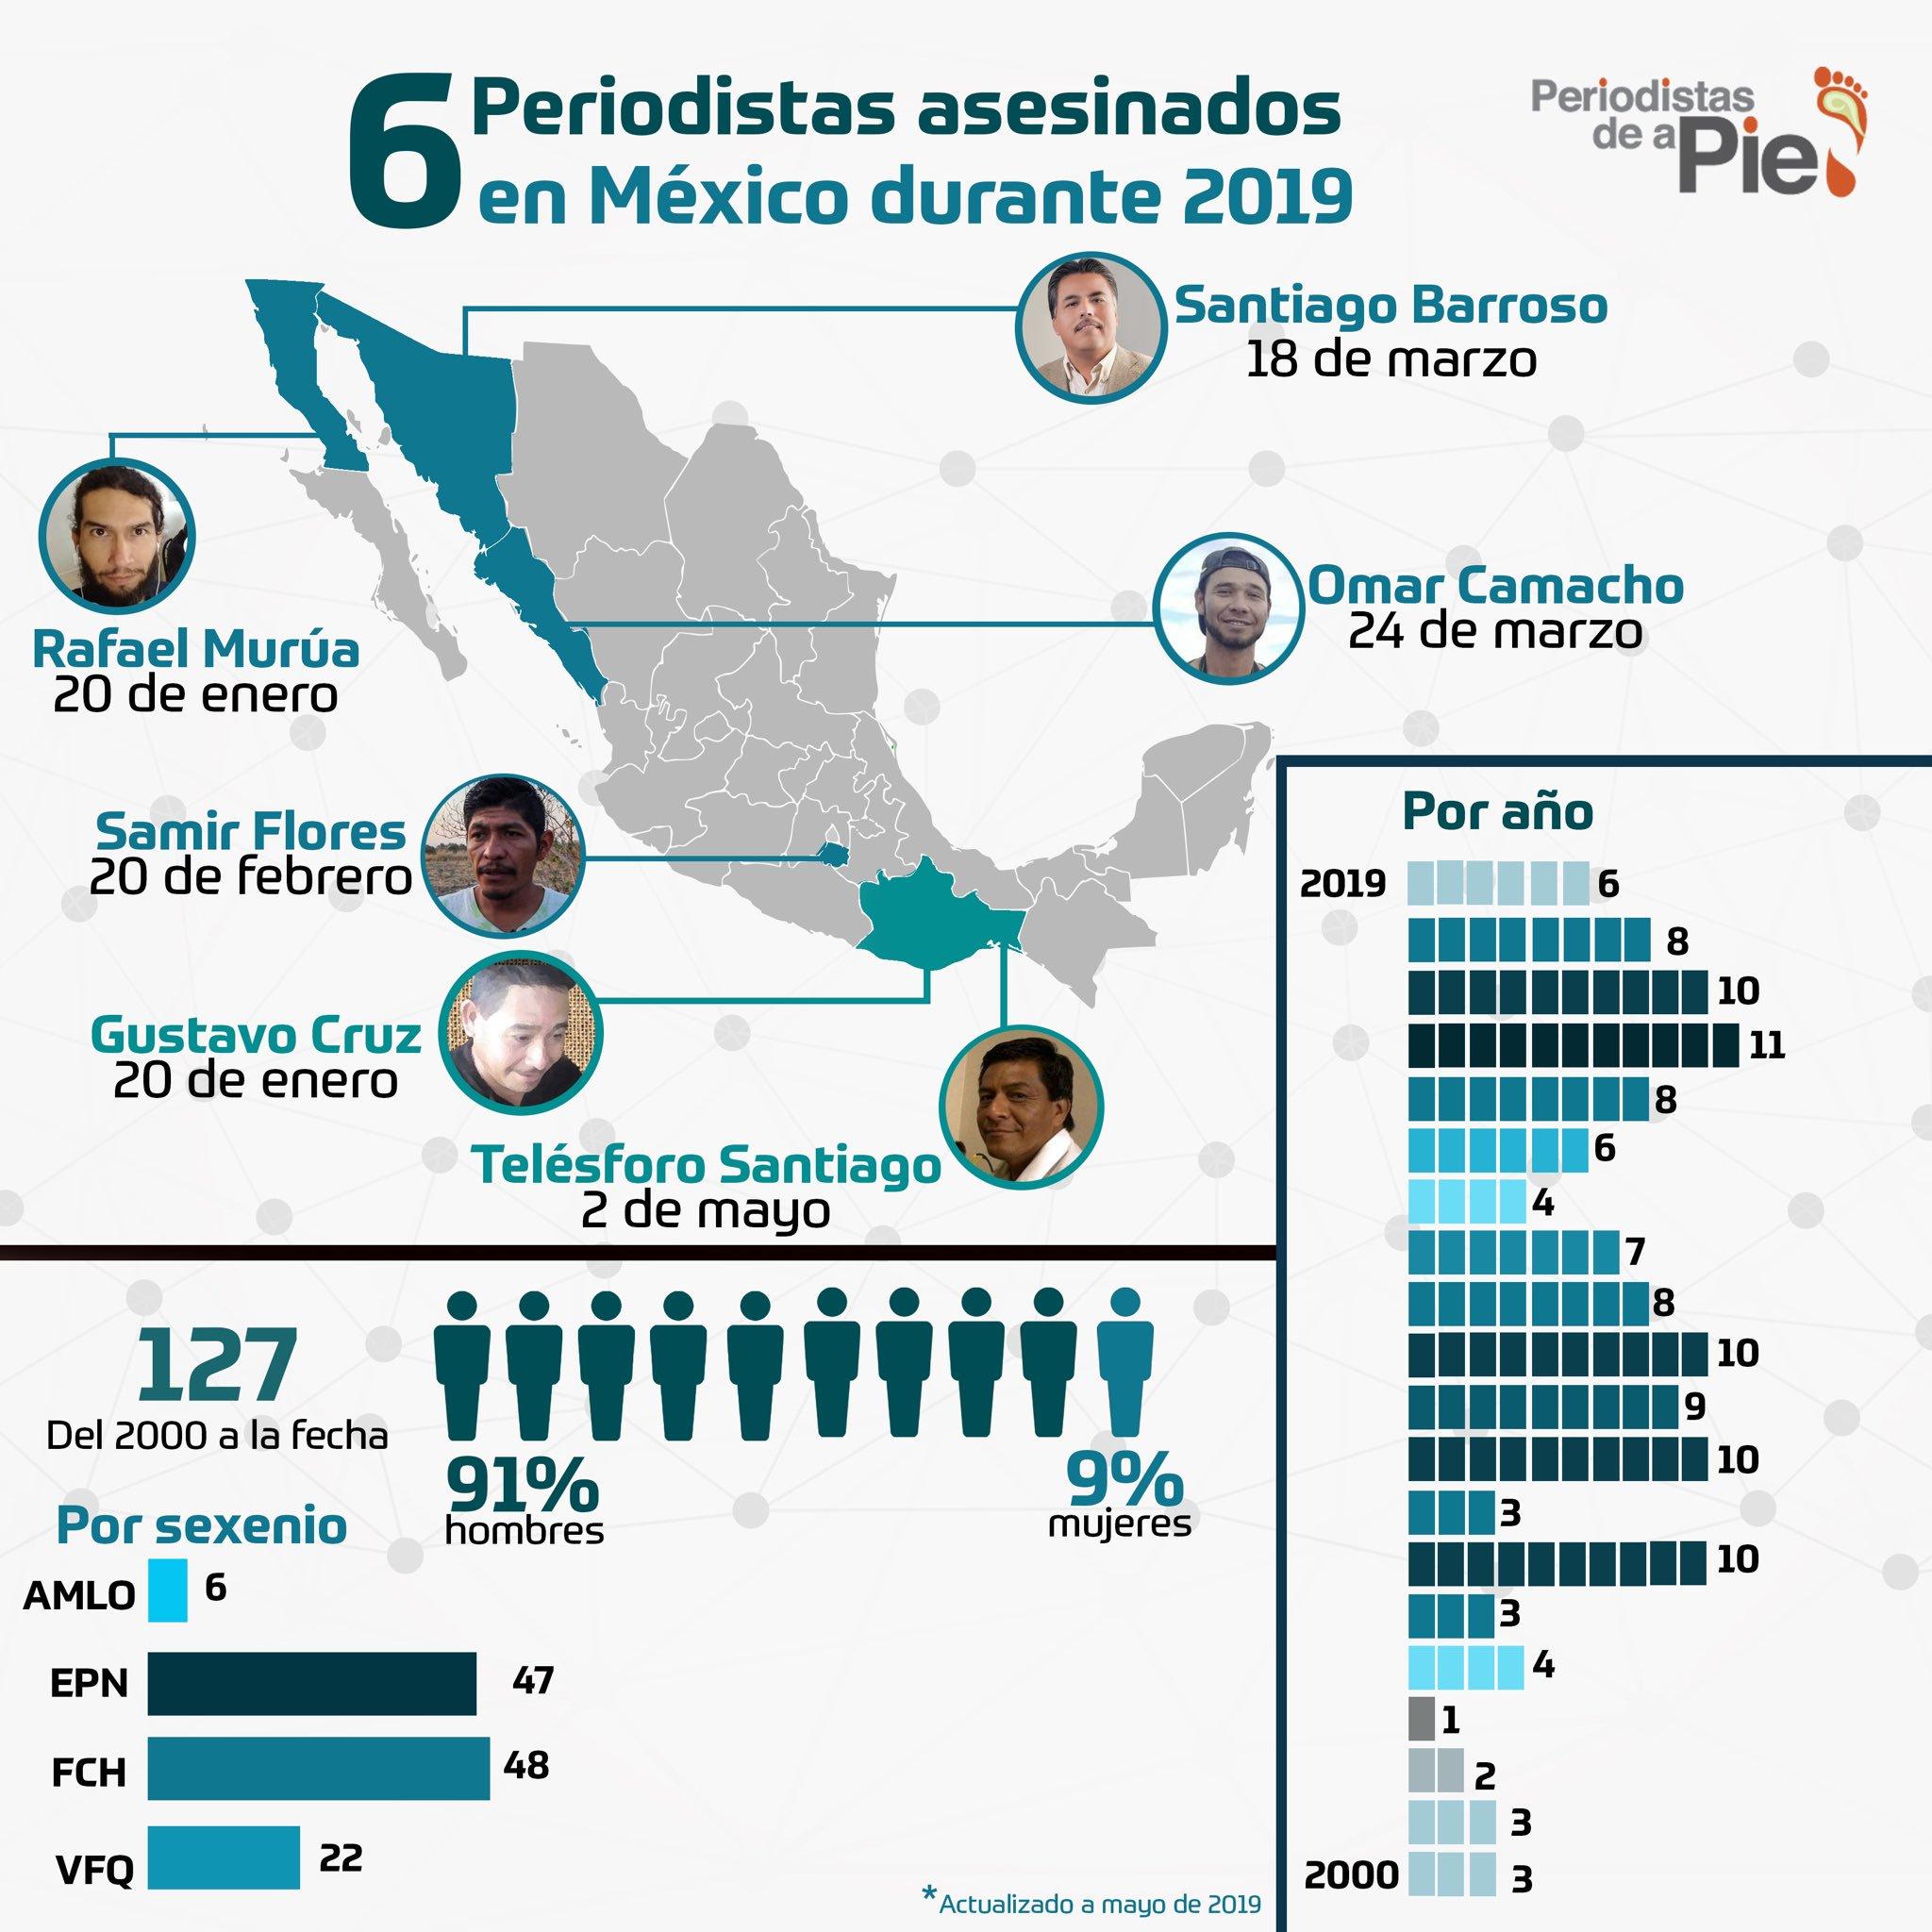 Periodistas asesinados en México durante 2019. Foto de Periodistas de a Pie